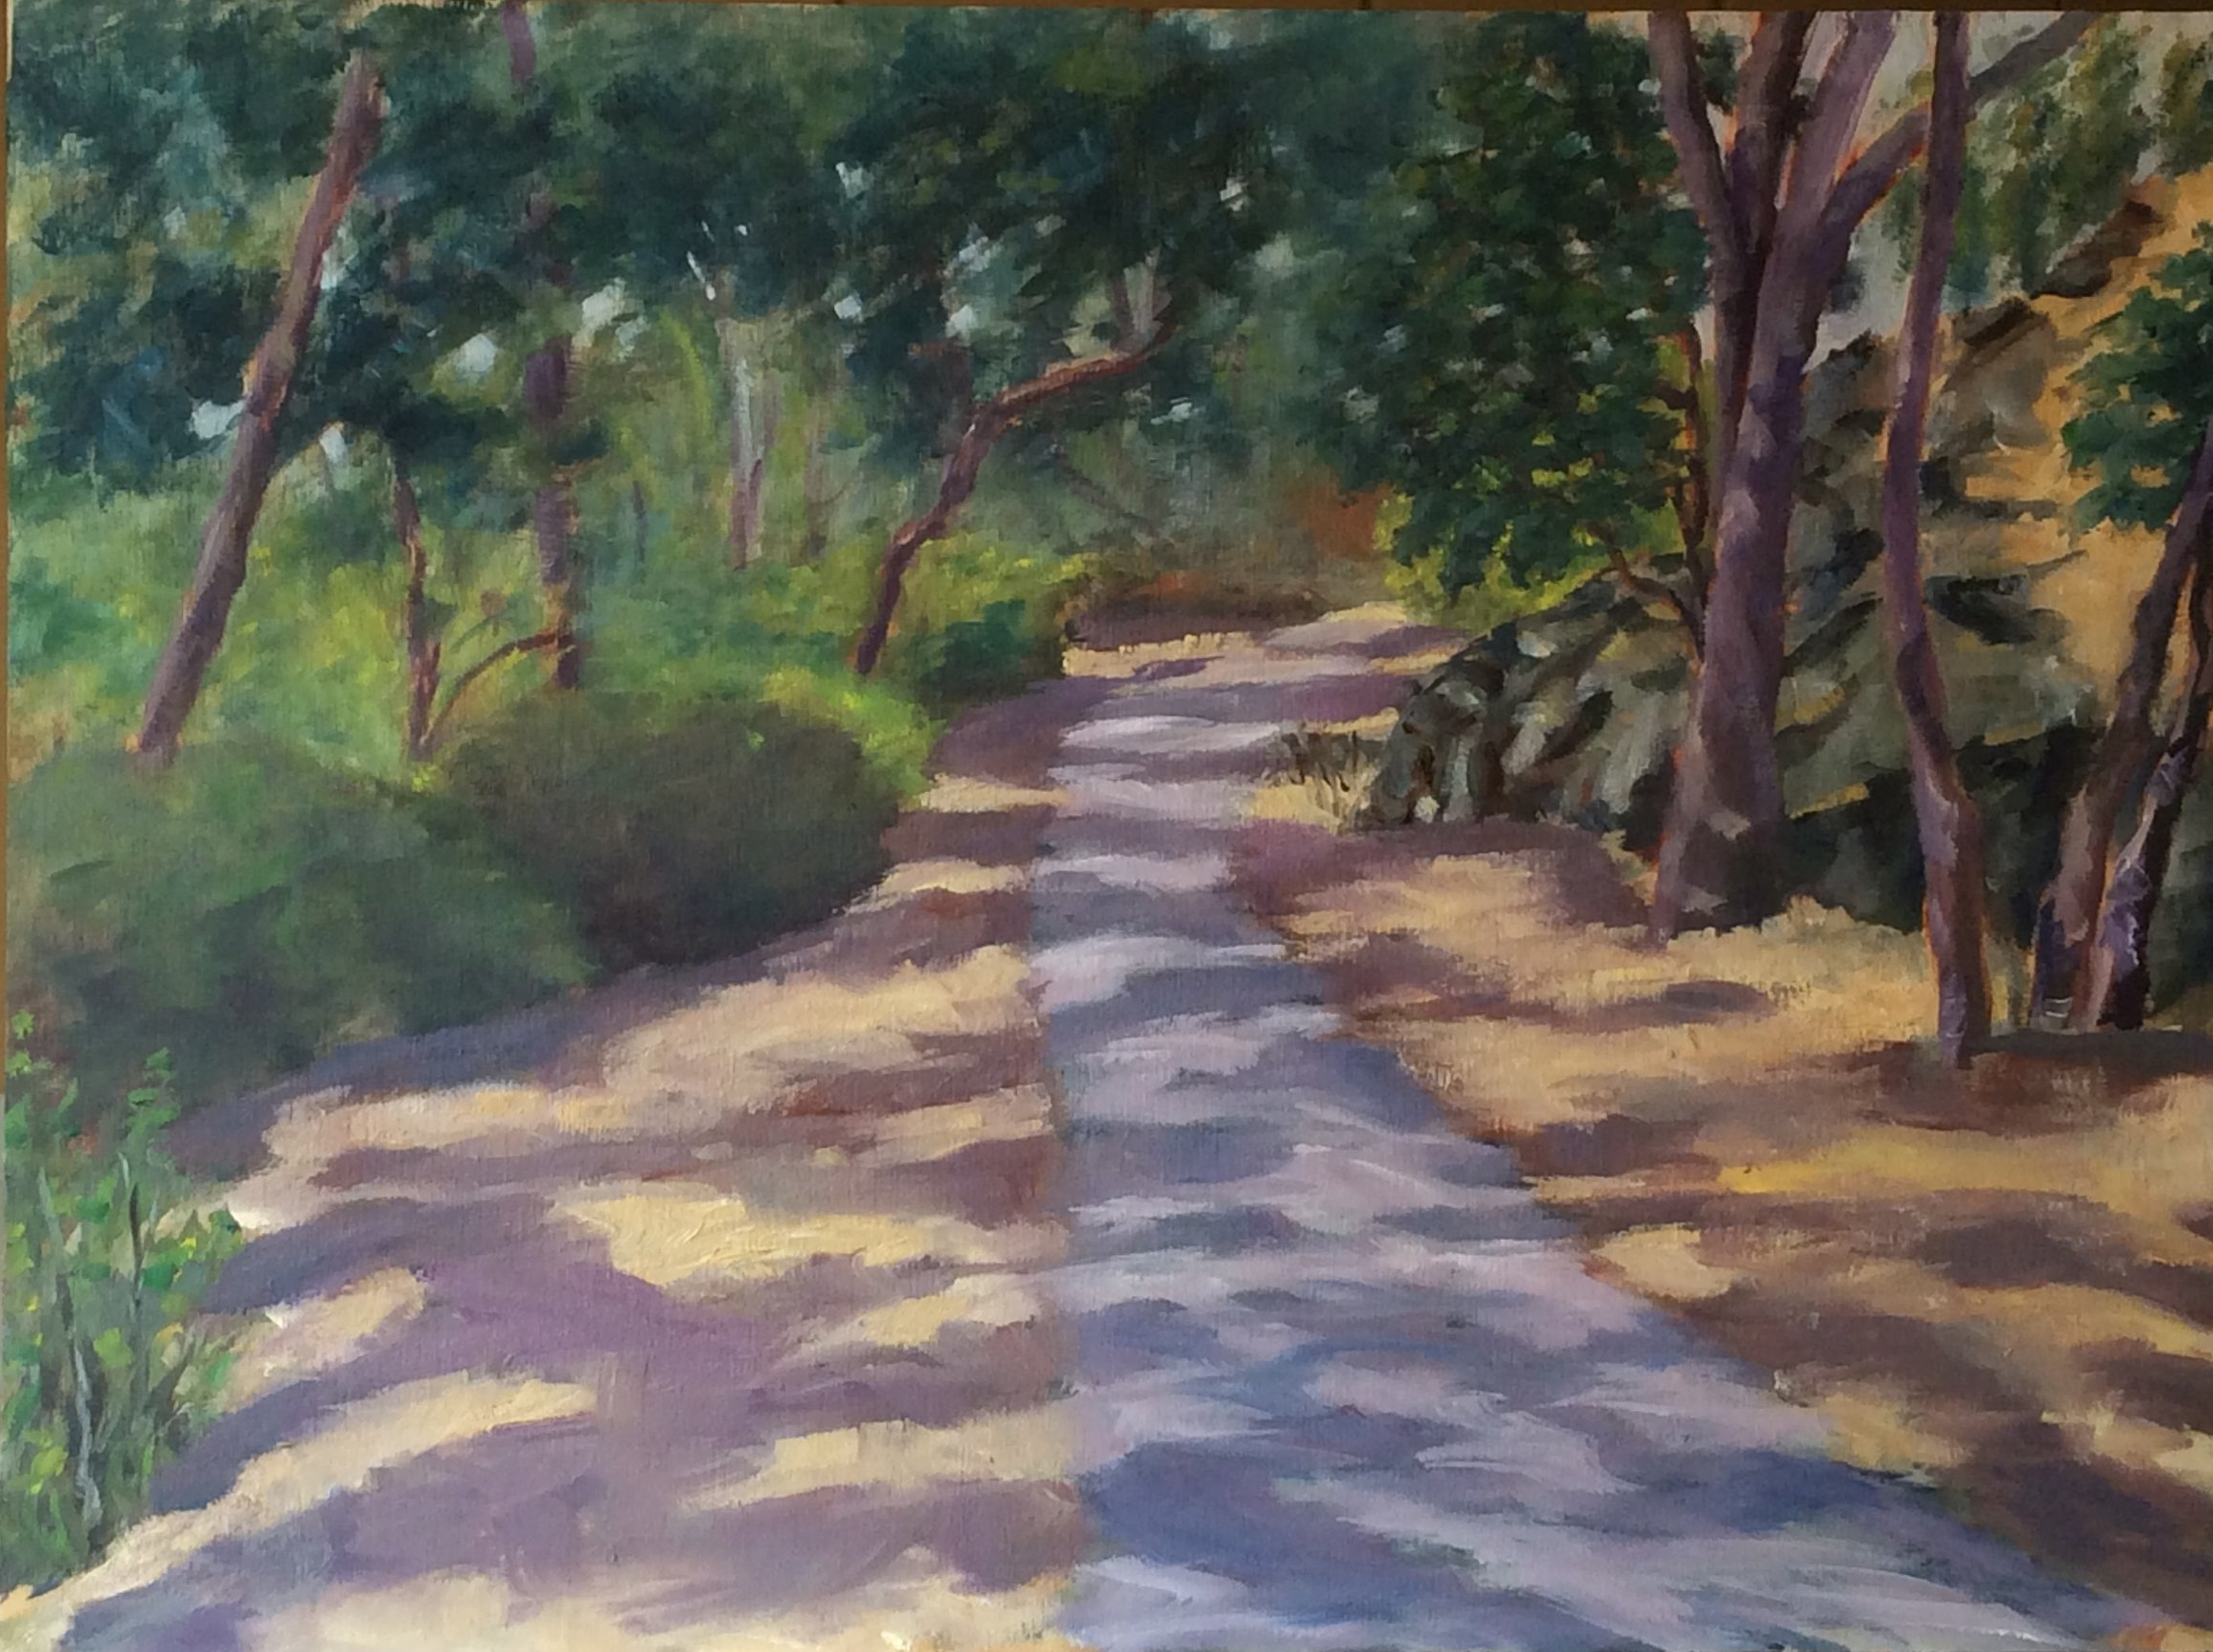 Dappled Pathway   Oil 12 x 16